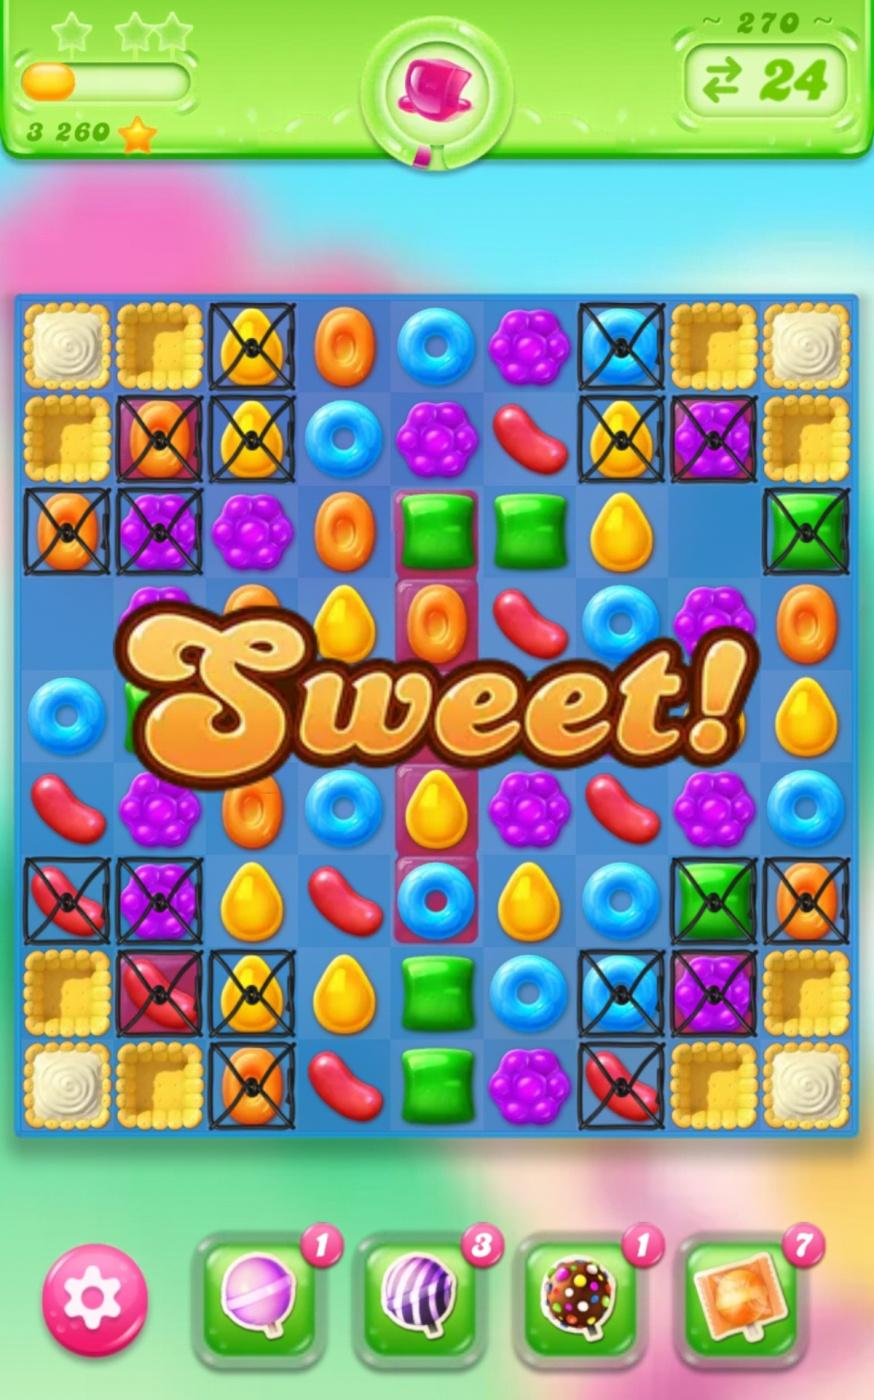 Screenshot_20210724-145326_Candy Crush Jelly.jpg